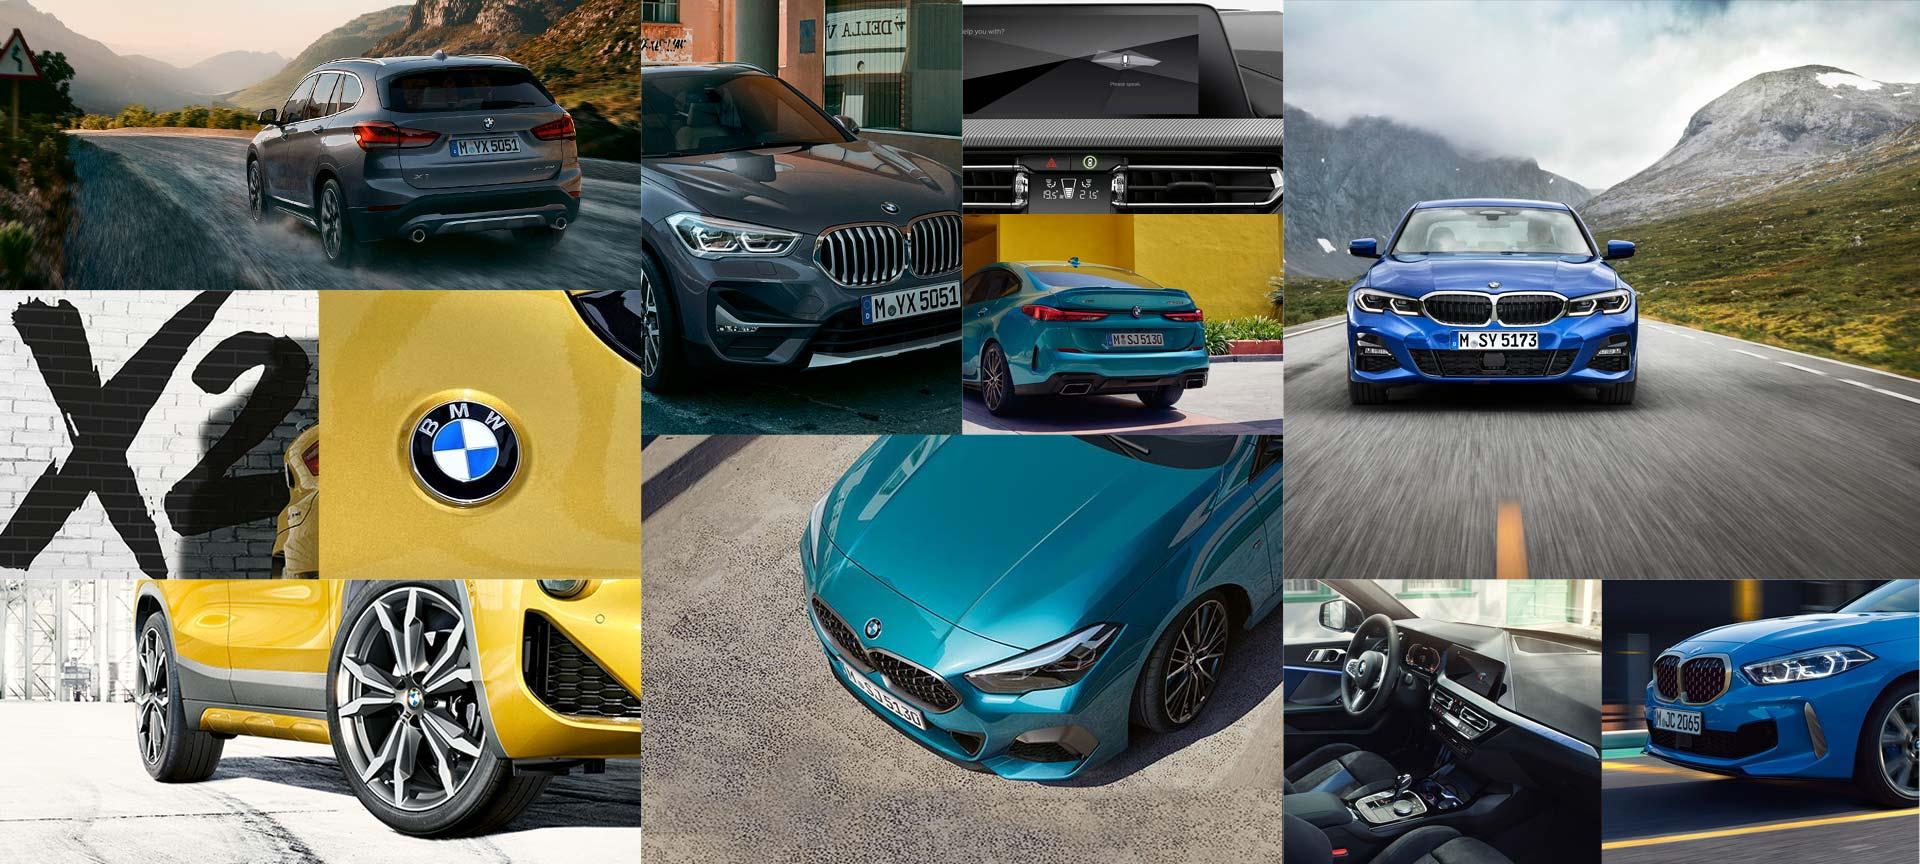 BMW 2021スプリングキャンペーン イメージ画像